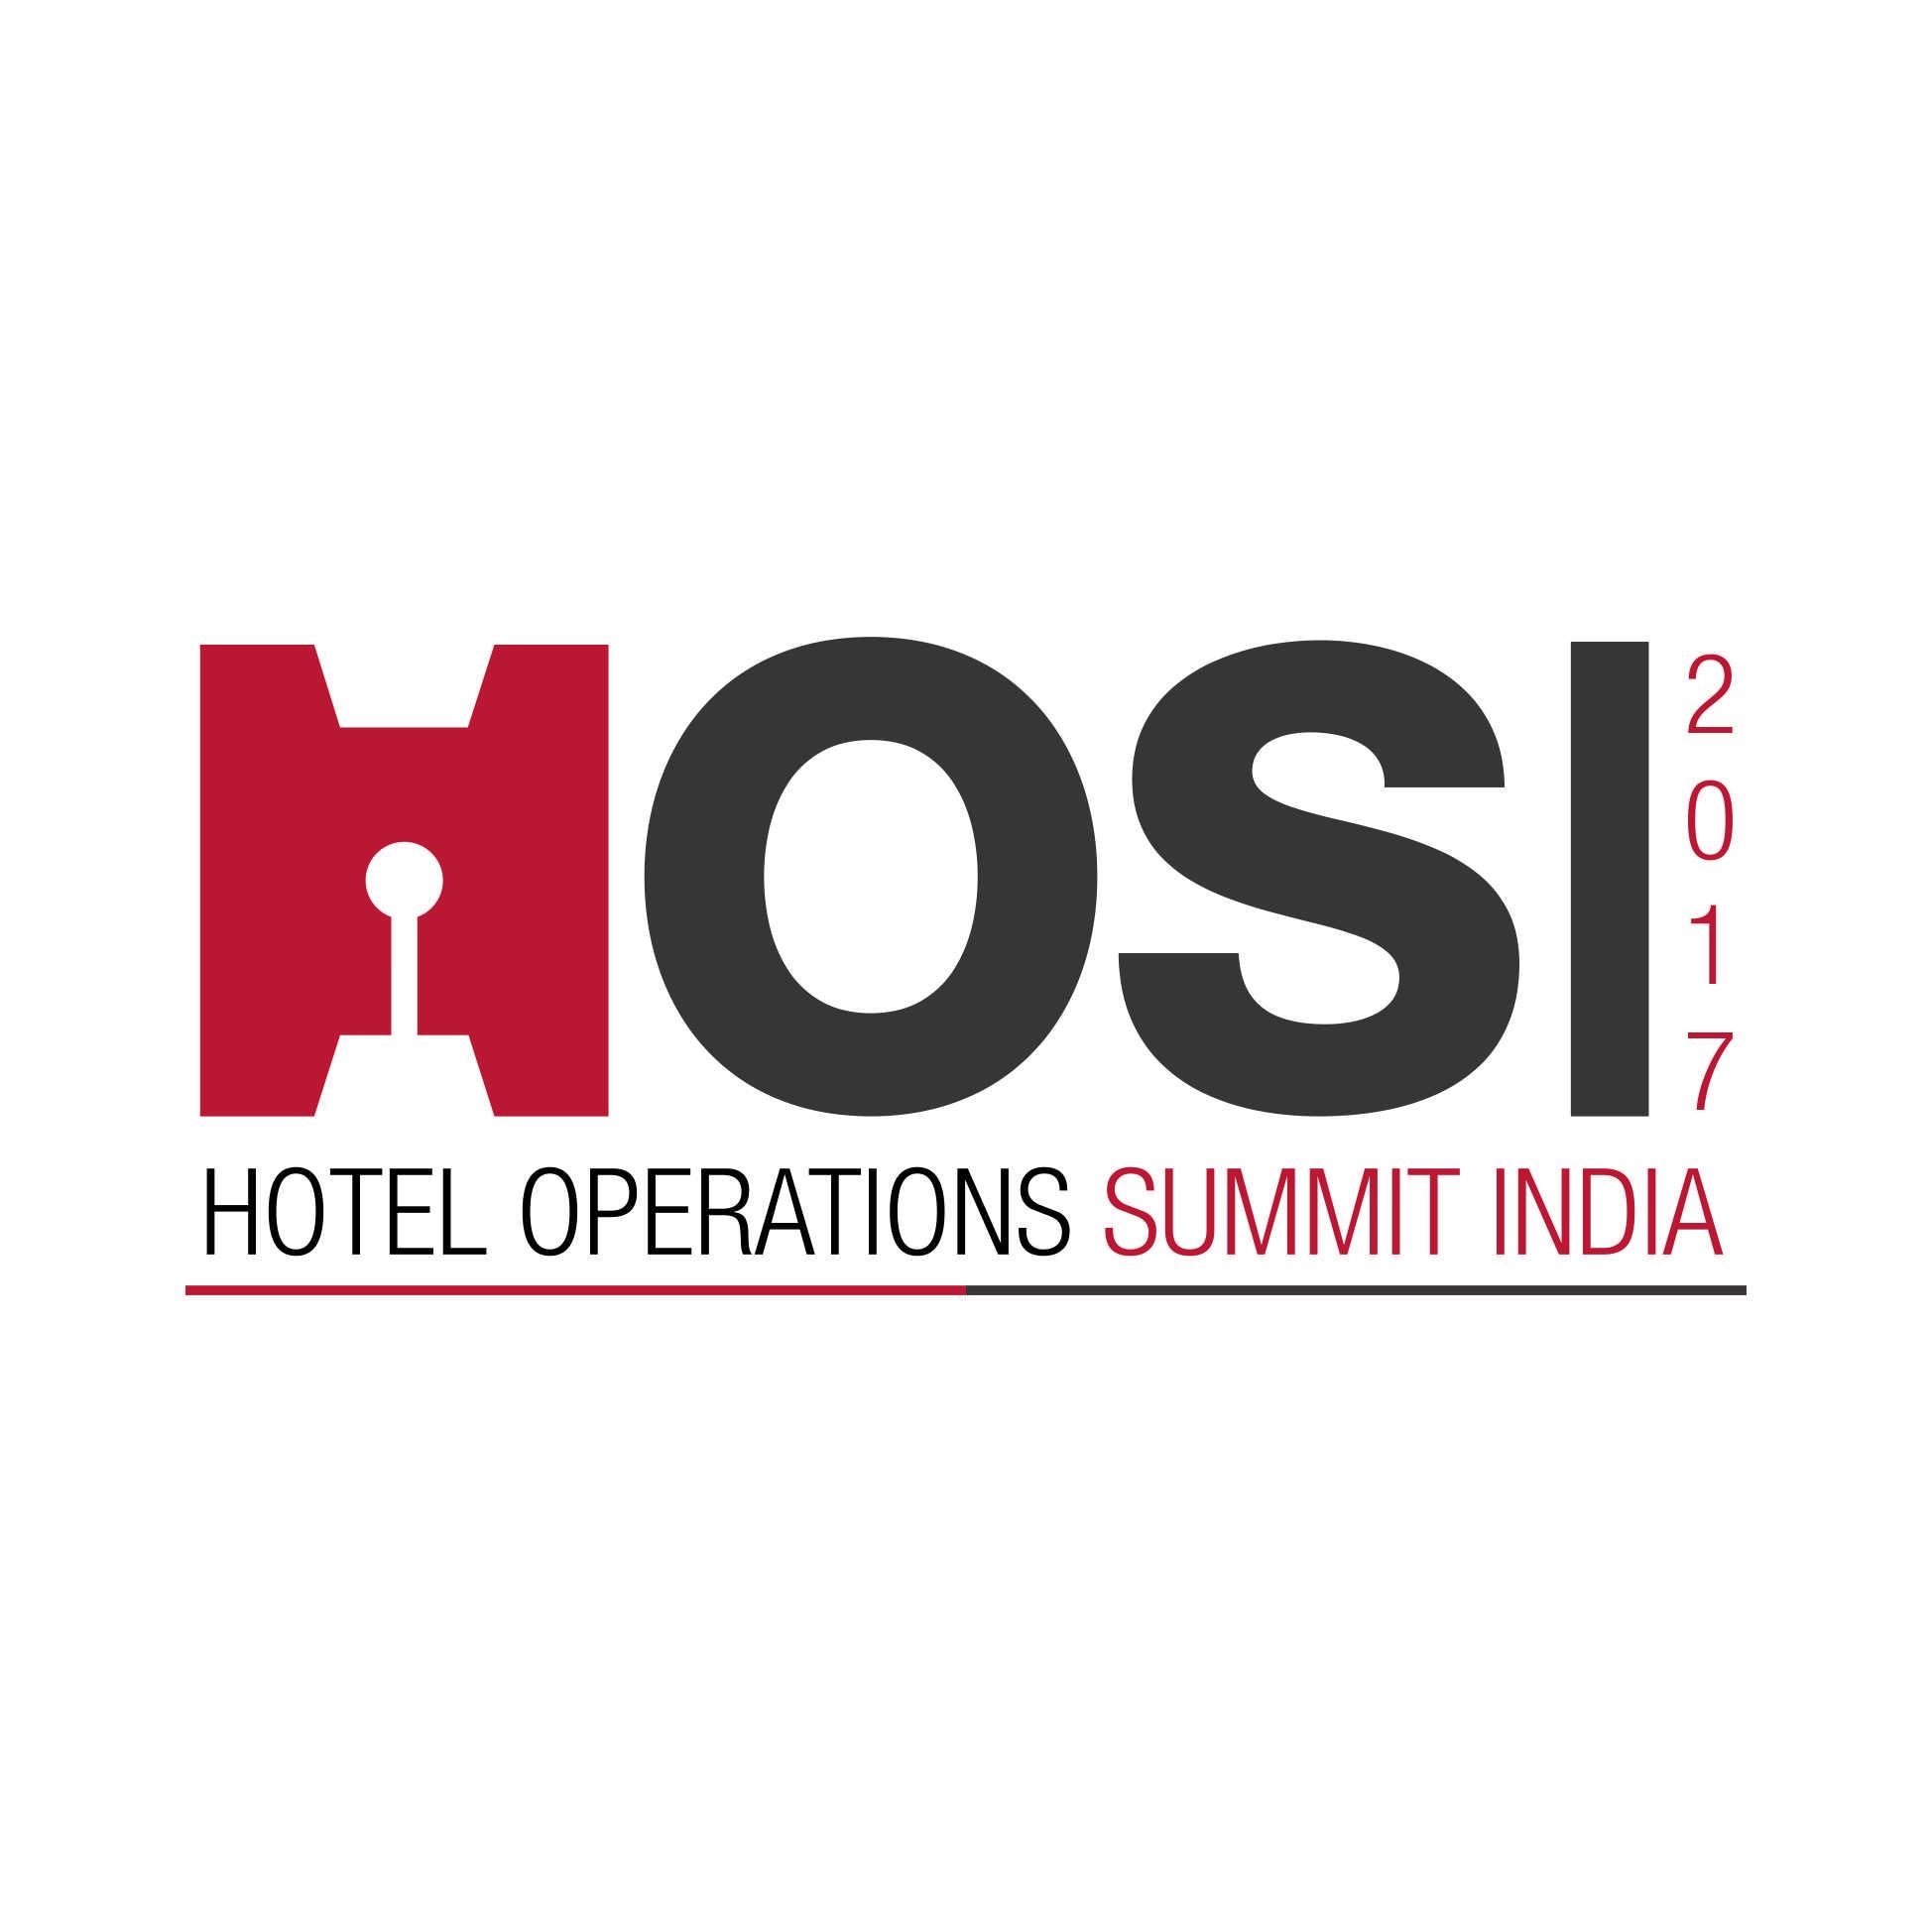 Hotel Operations Summit India (HOSI)